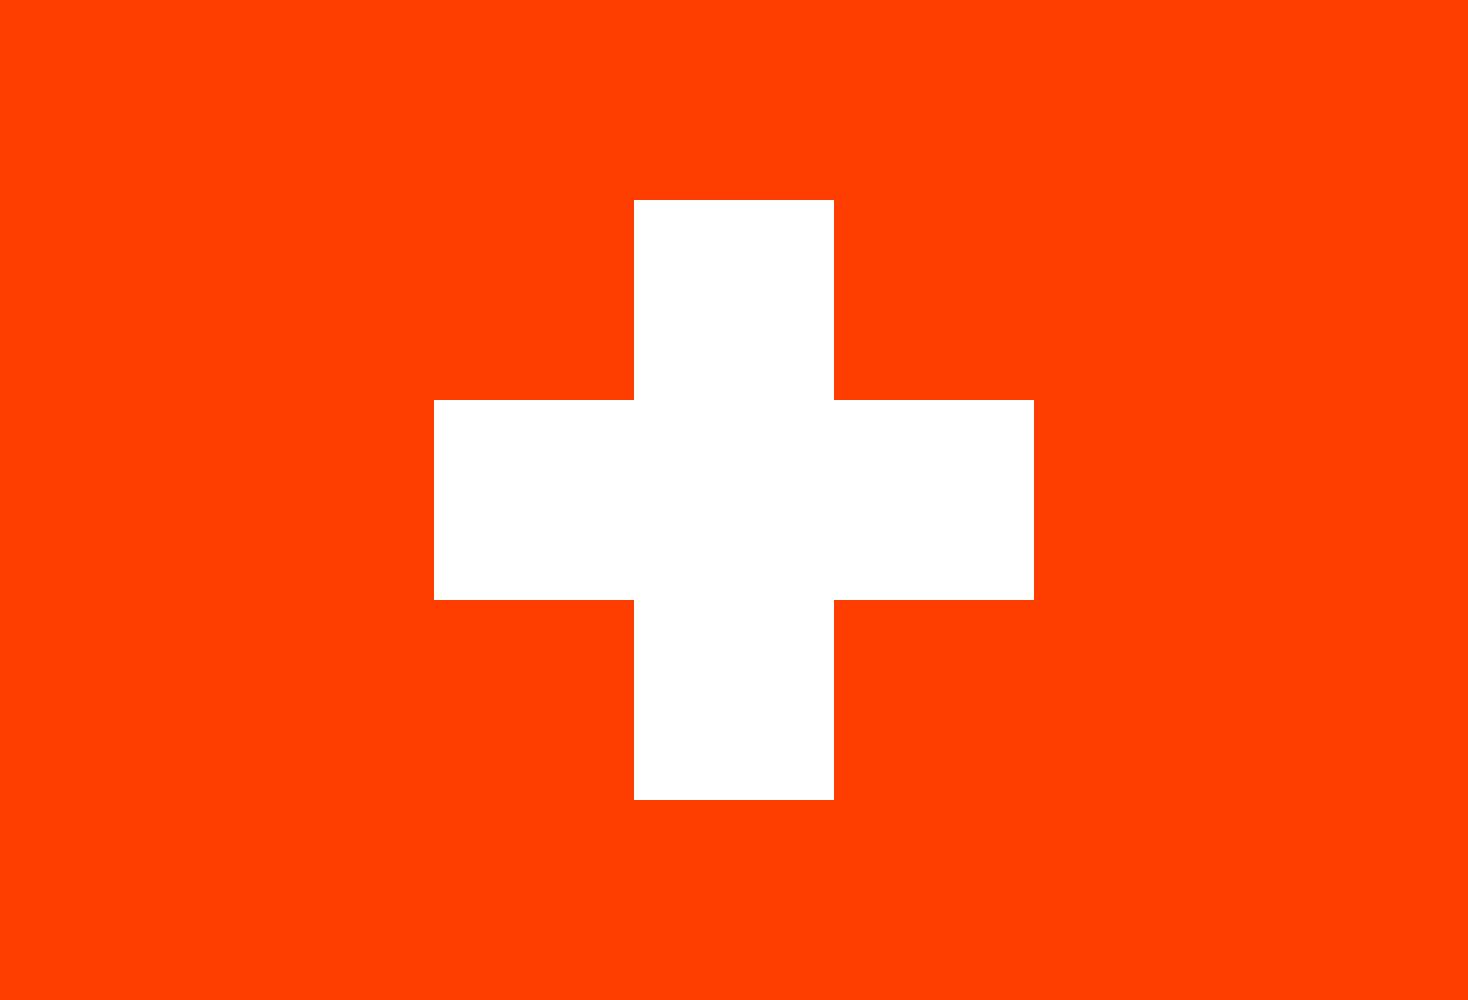 Flagg_Sveits_Ny_Orginal